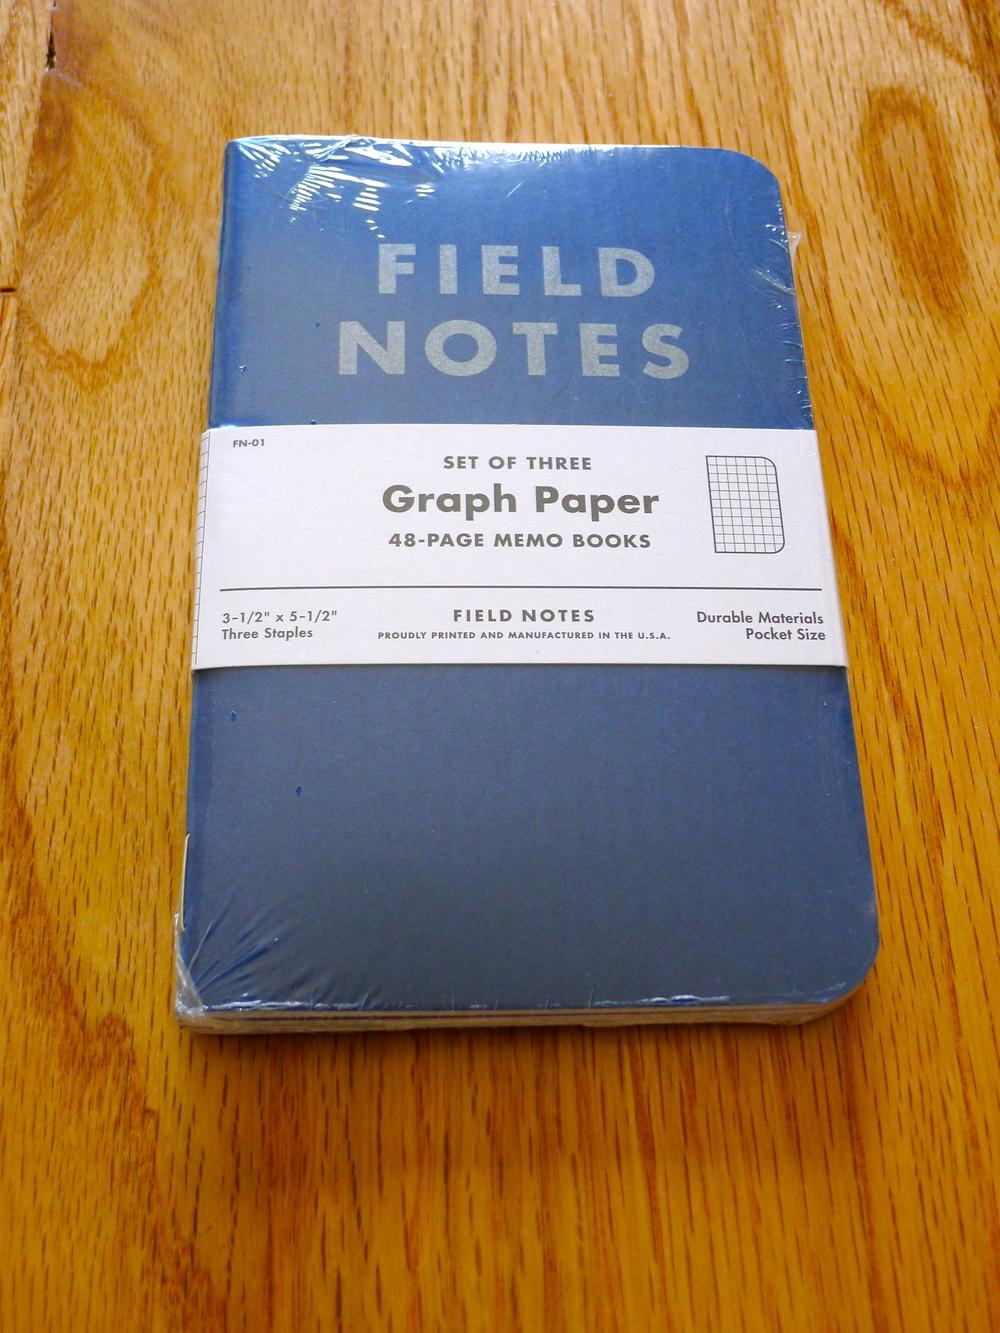 Field Notes American Tradesman Edition - Summer 2011